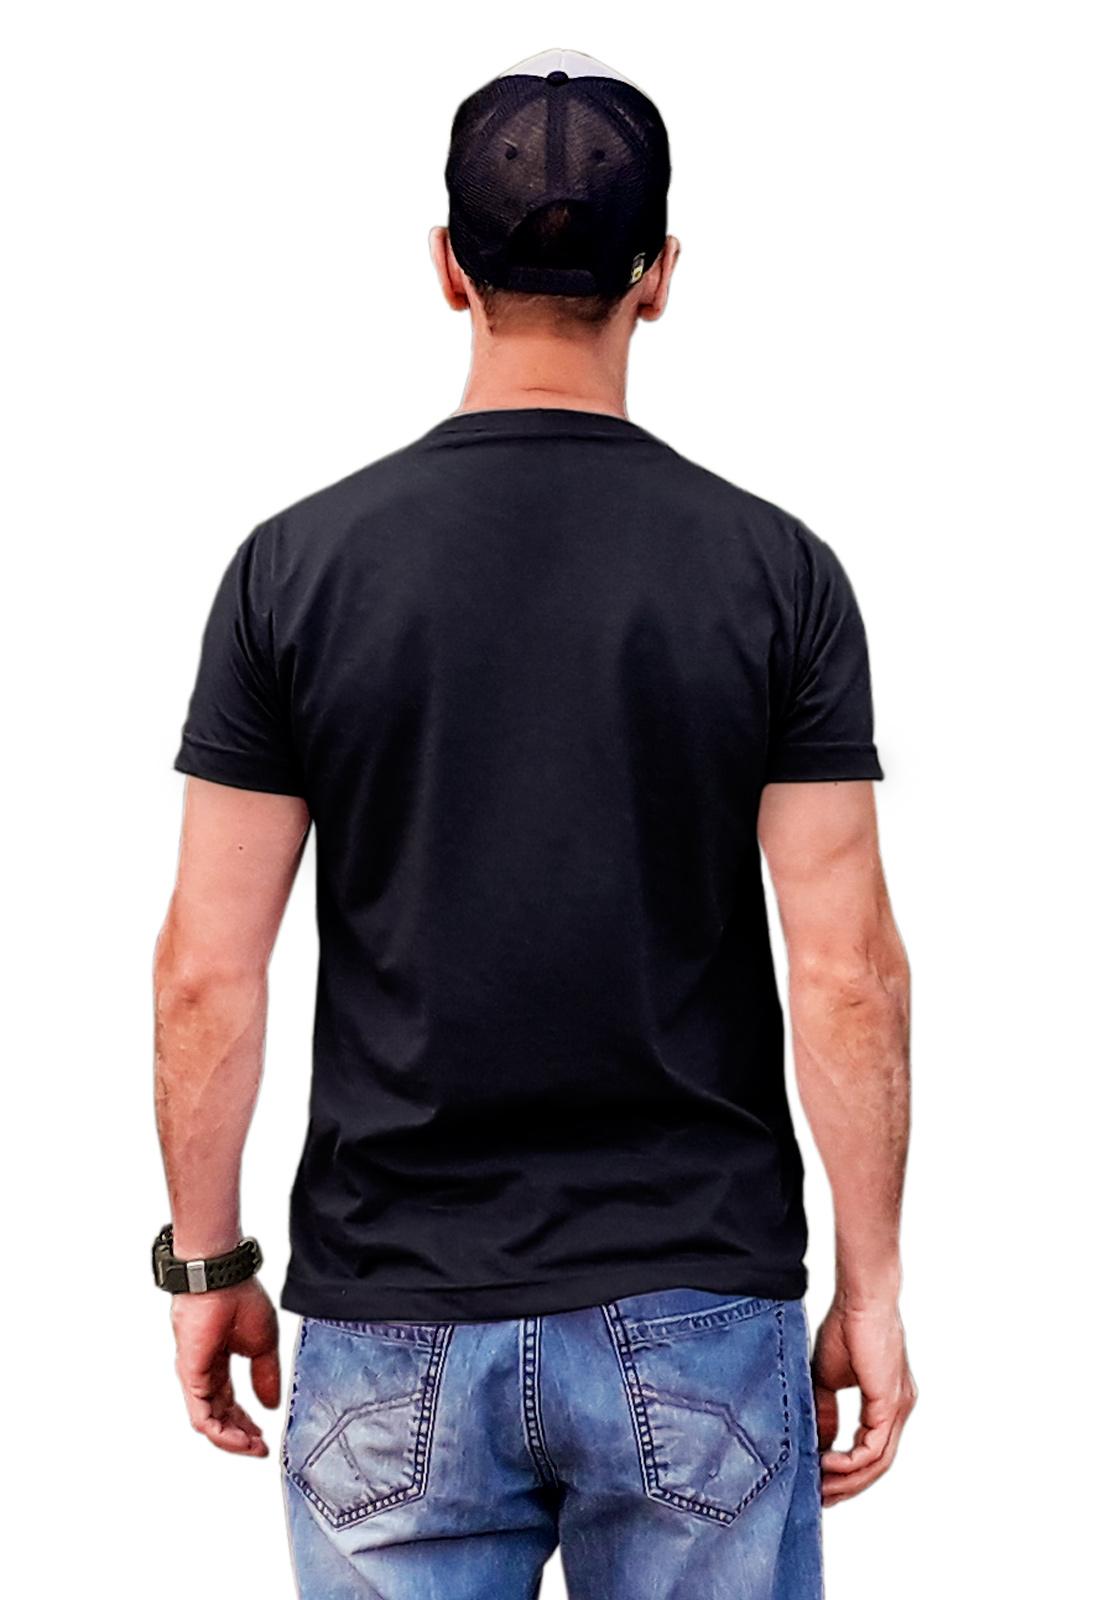 Camiseta básica sustentável preta que preserva